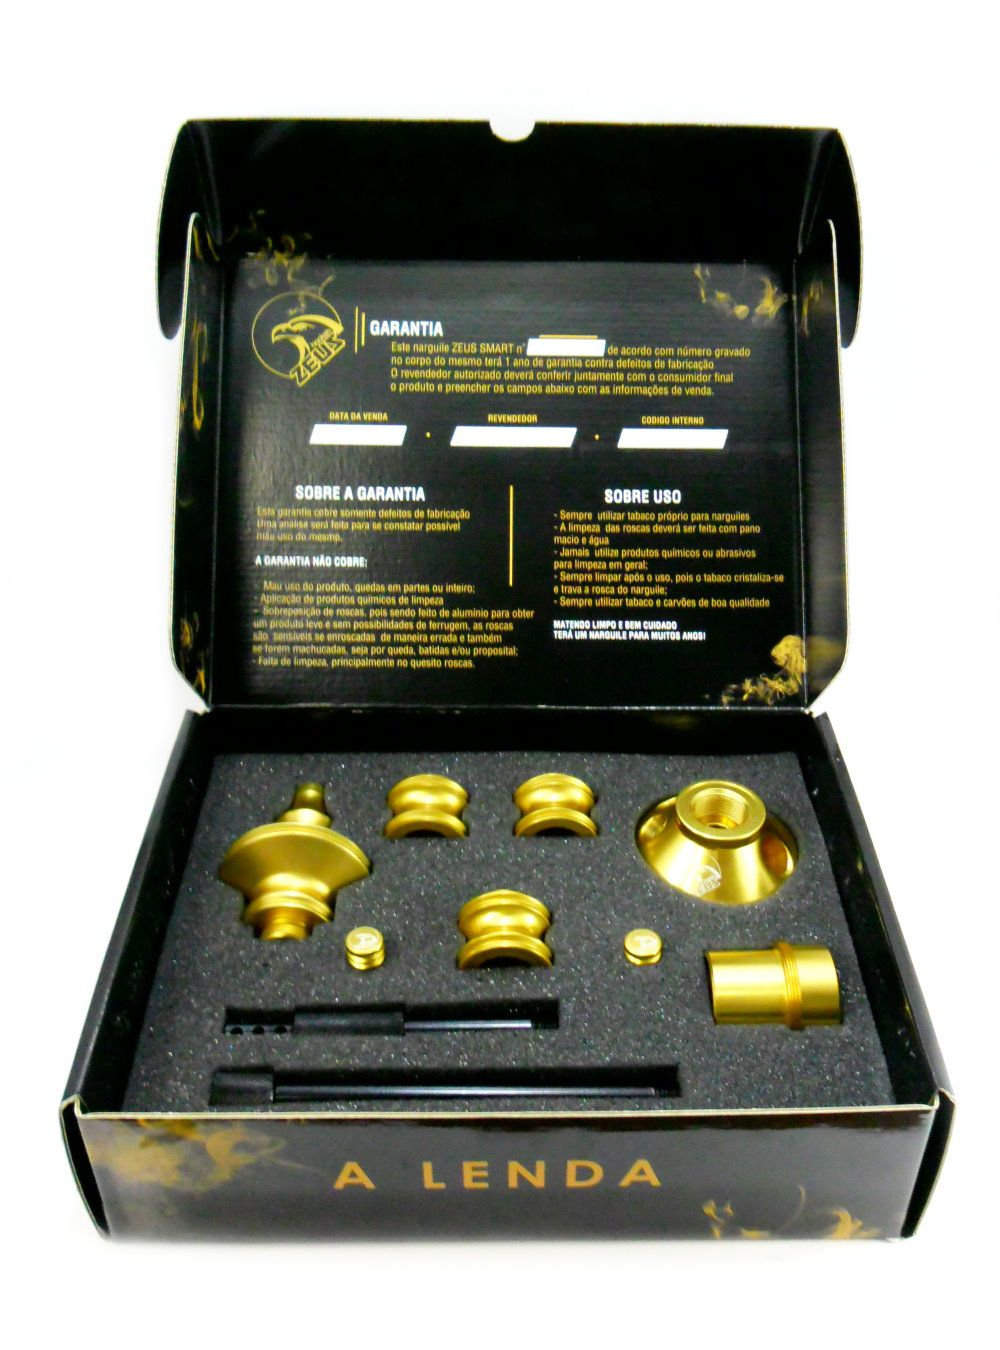 Stem (corpo de narguile) Zeus Smart Híbrido - cor Dourado